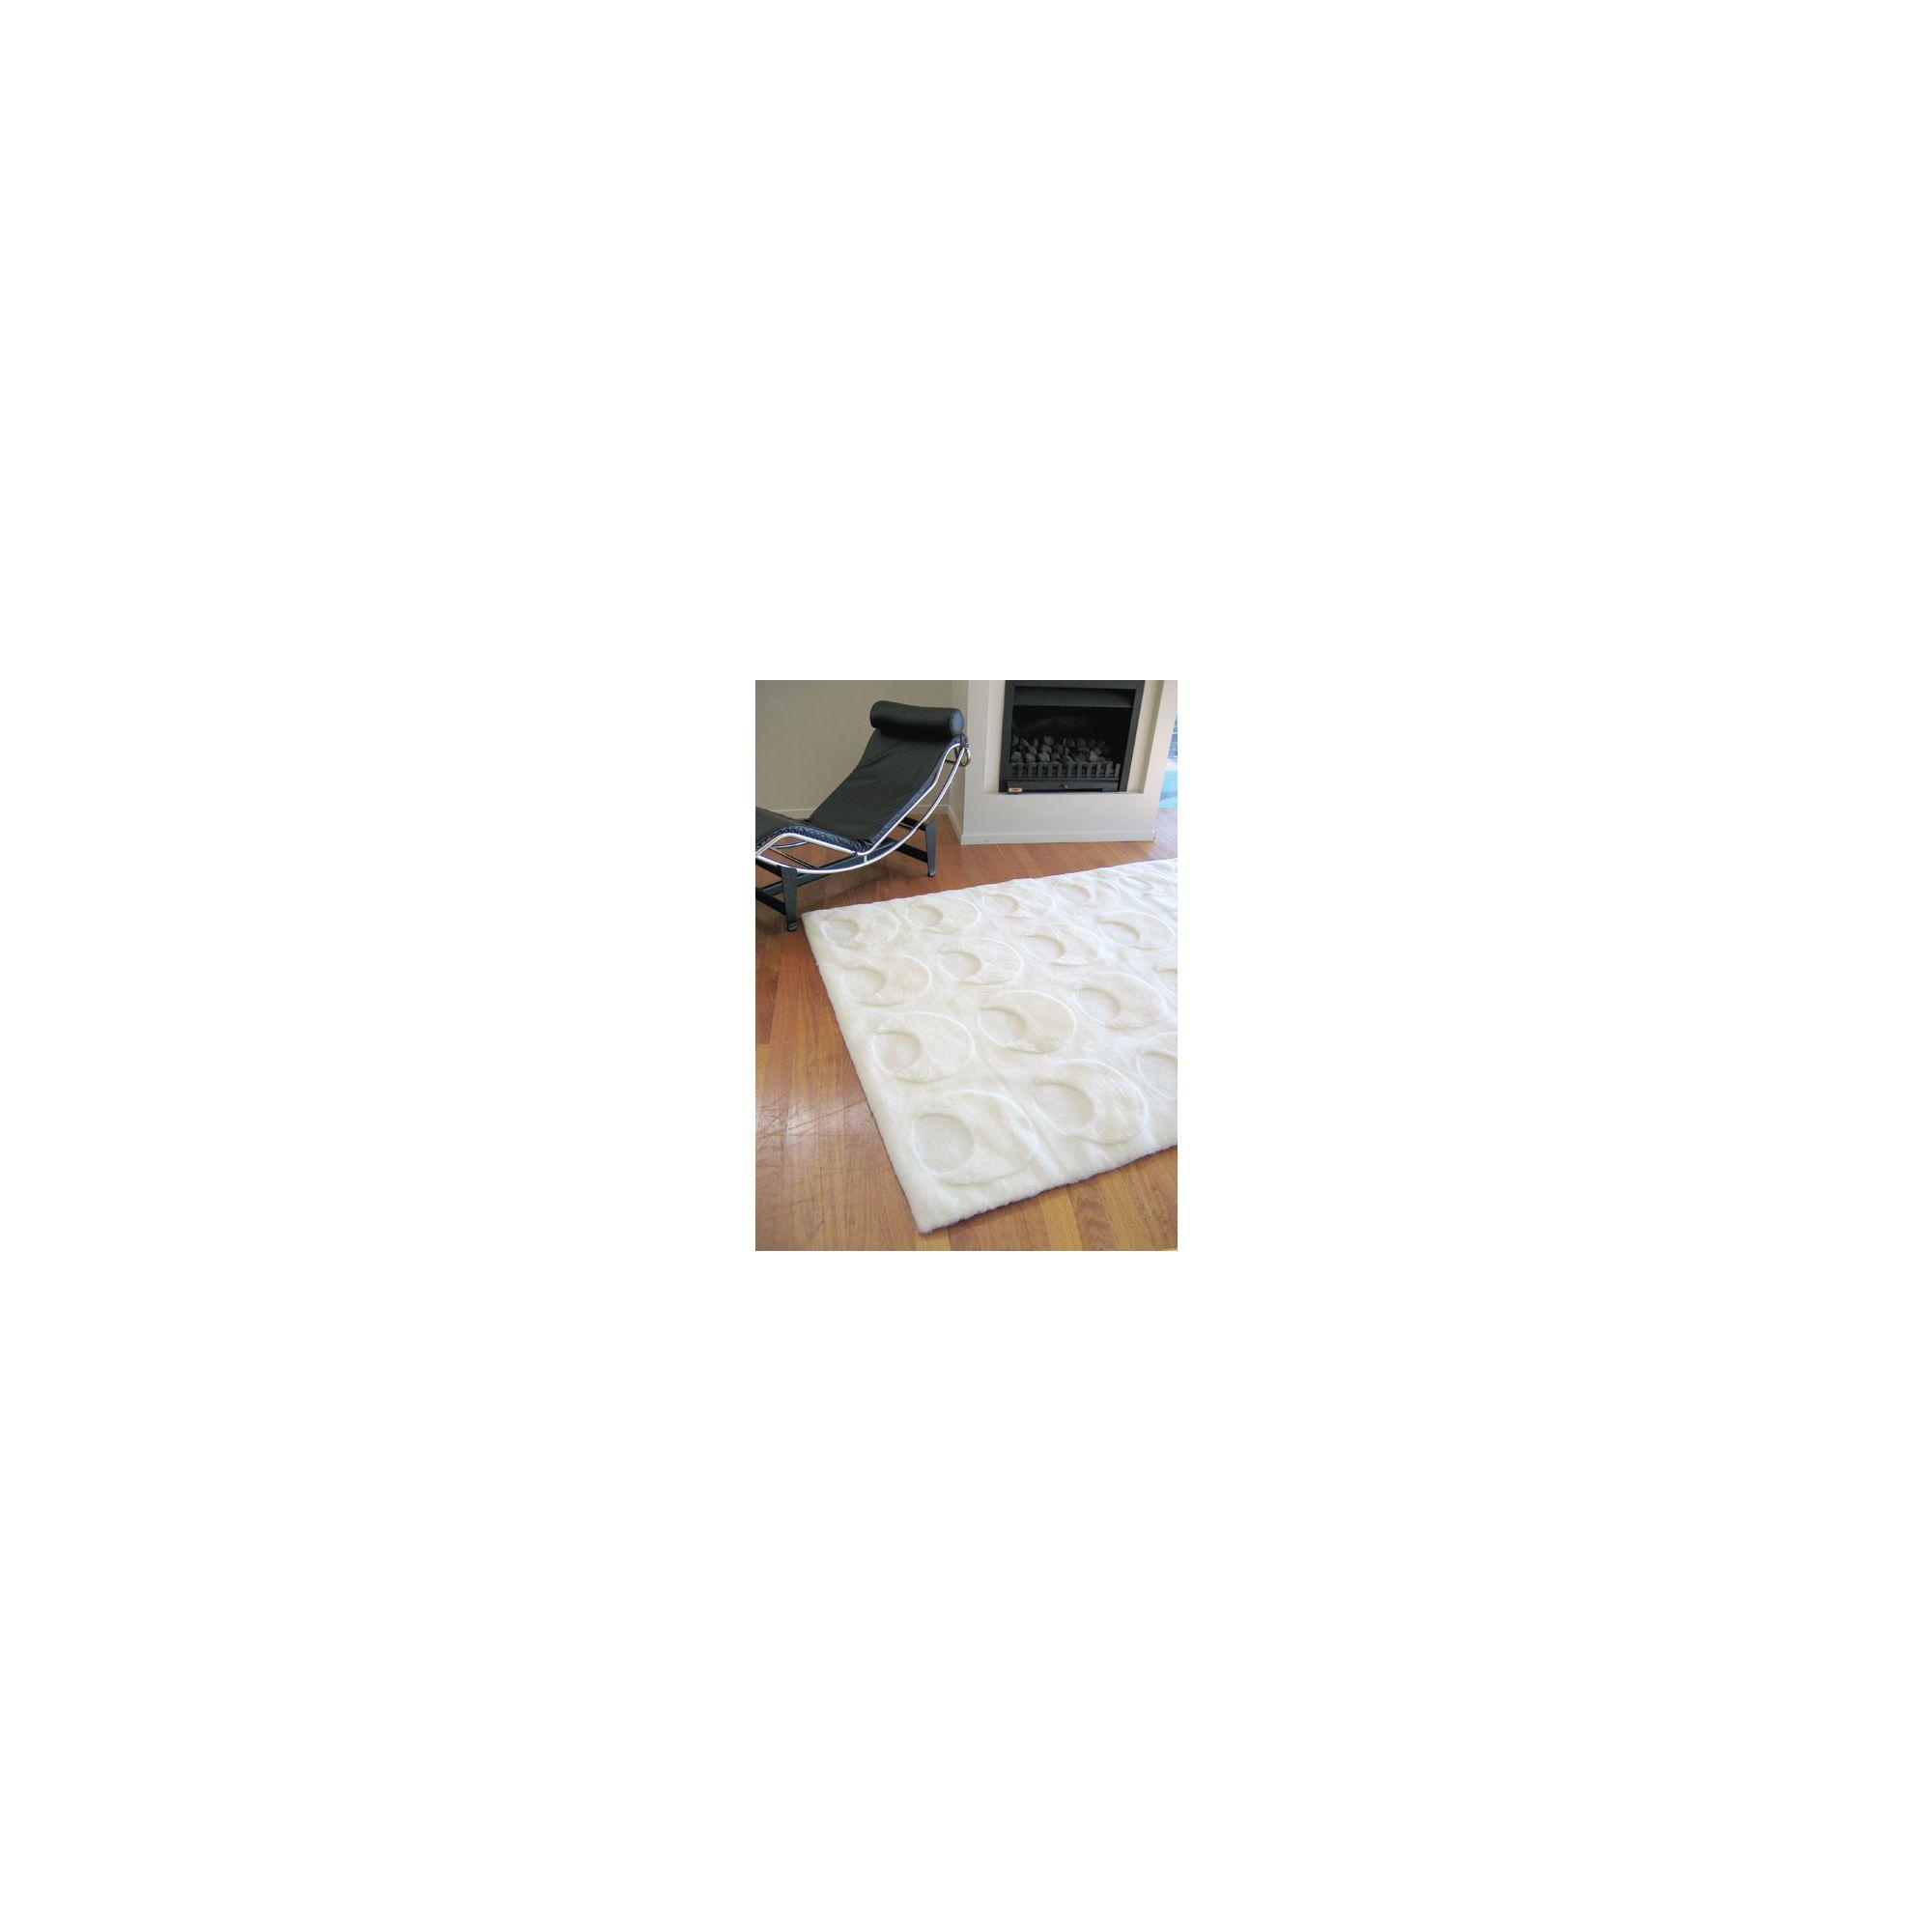 Bowron Sheepskin Shortwool Design Solar Rug - 240cm H x 65cm W x 1cm D at Tesco Direct